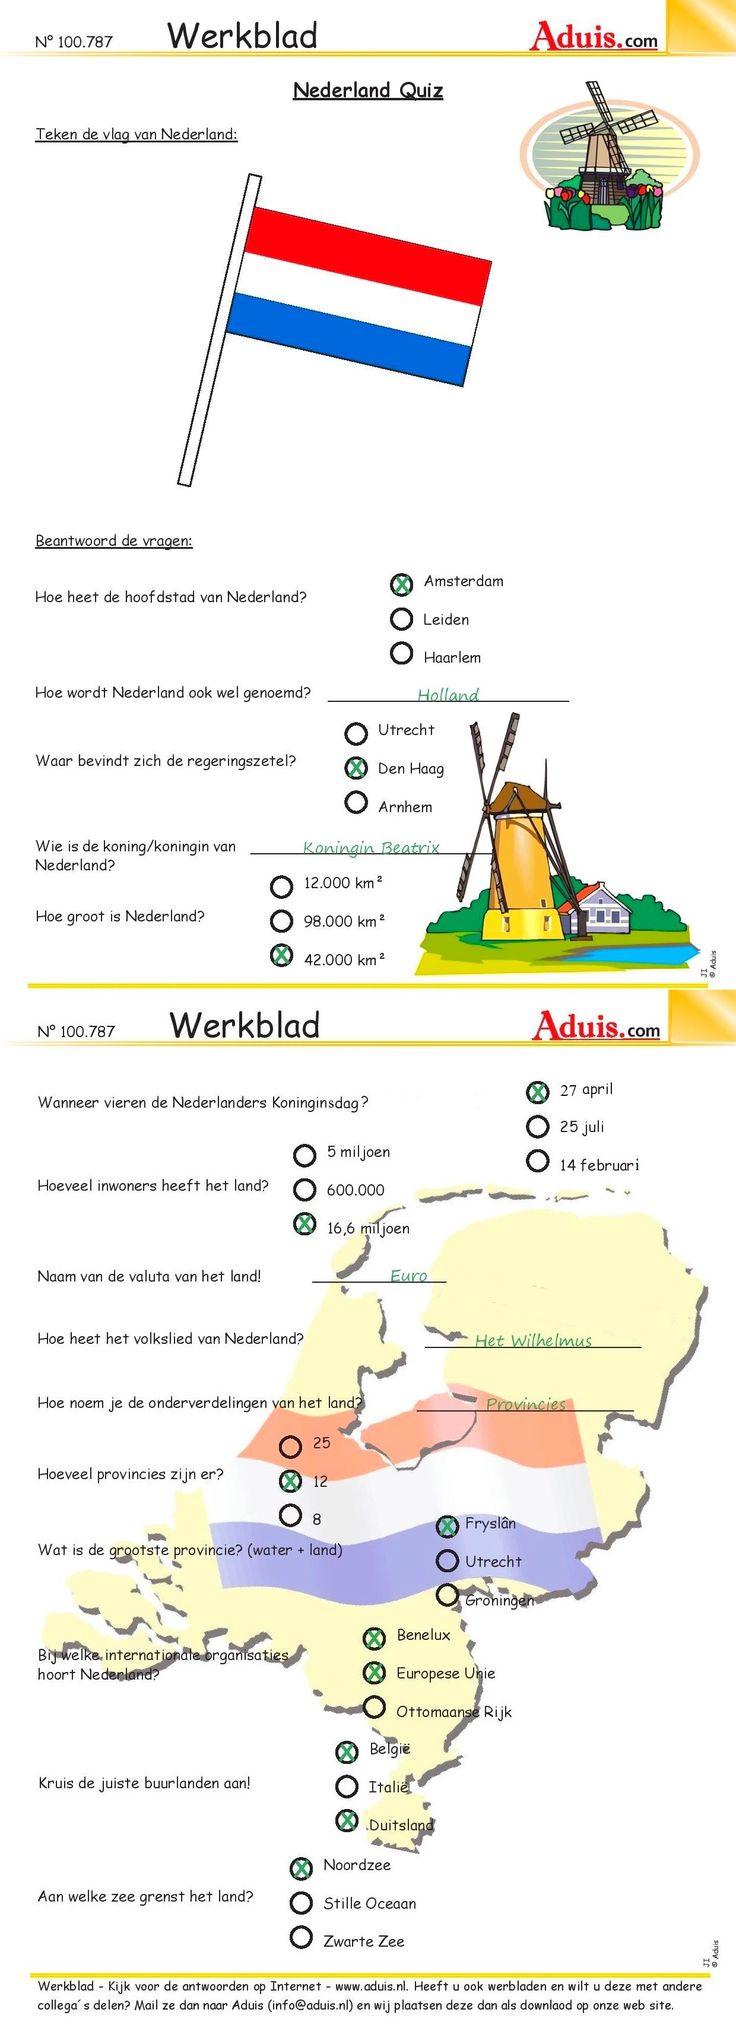 Werkblad : Nederland Quiz - OPLOSSINGEN